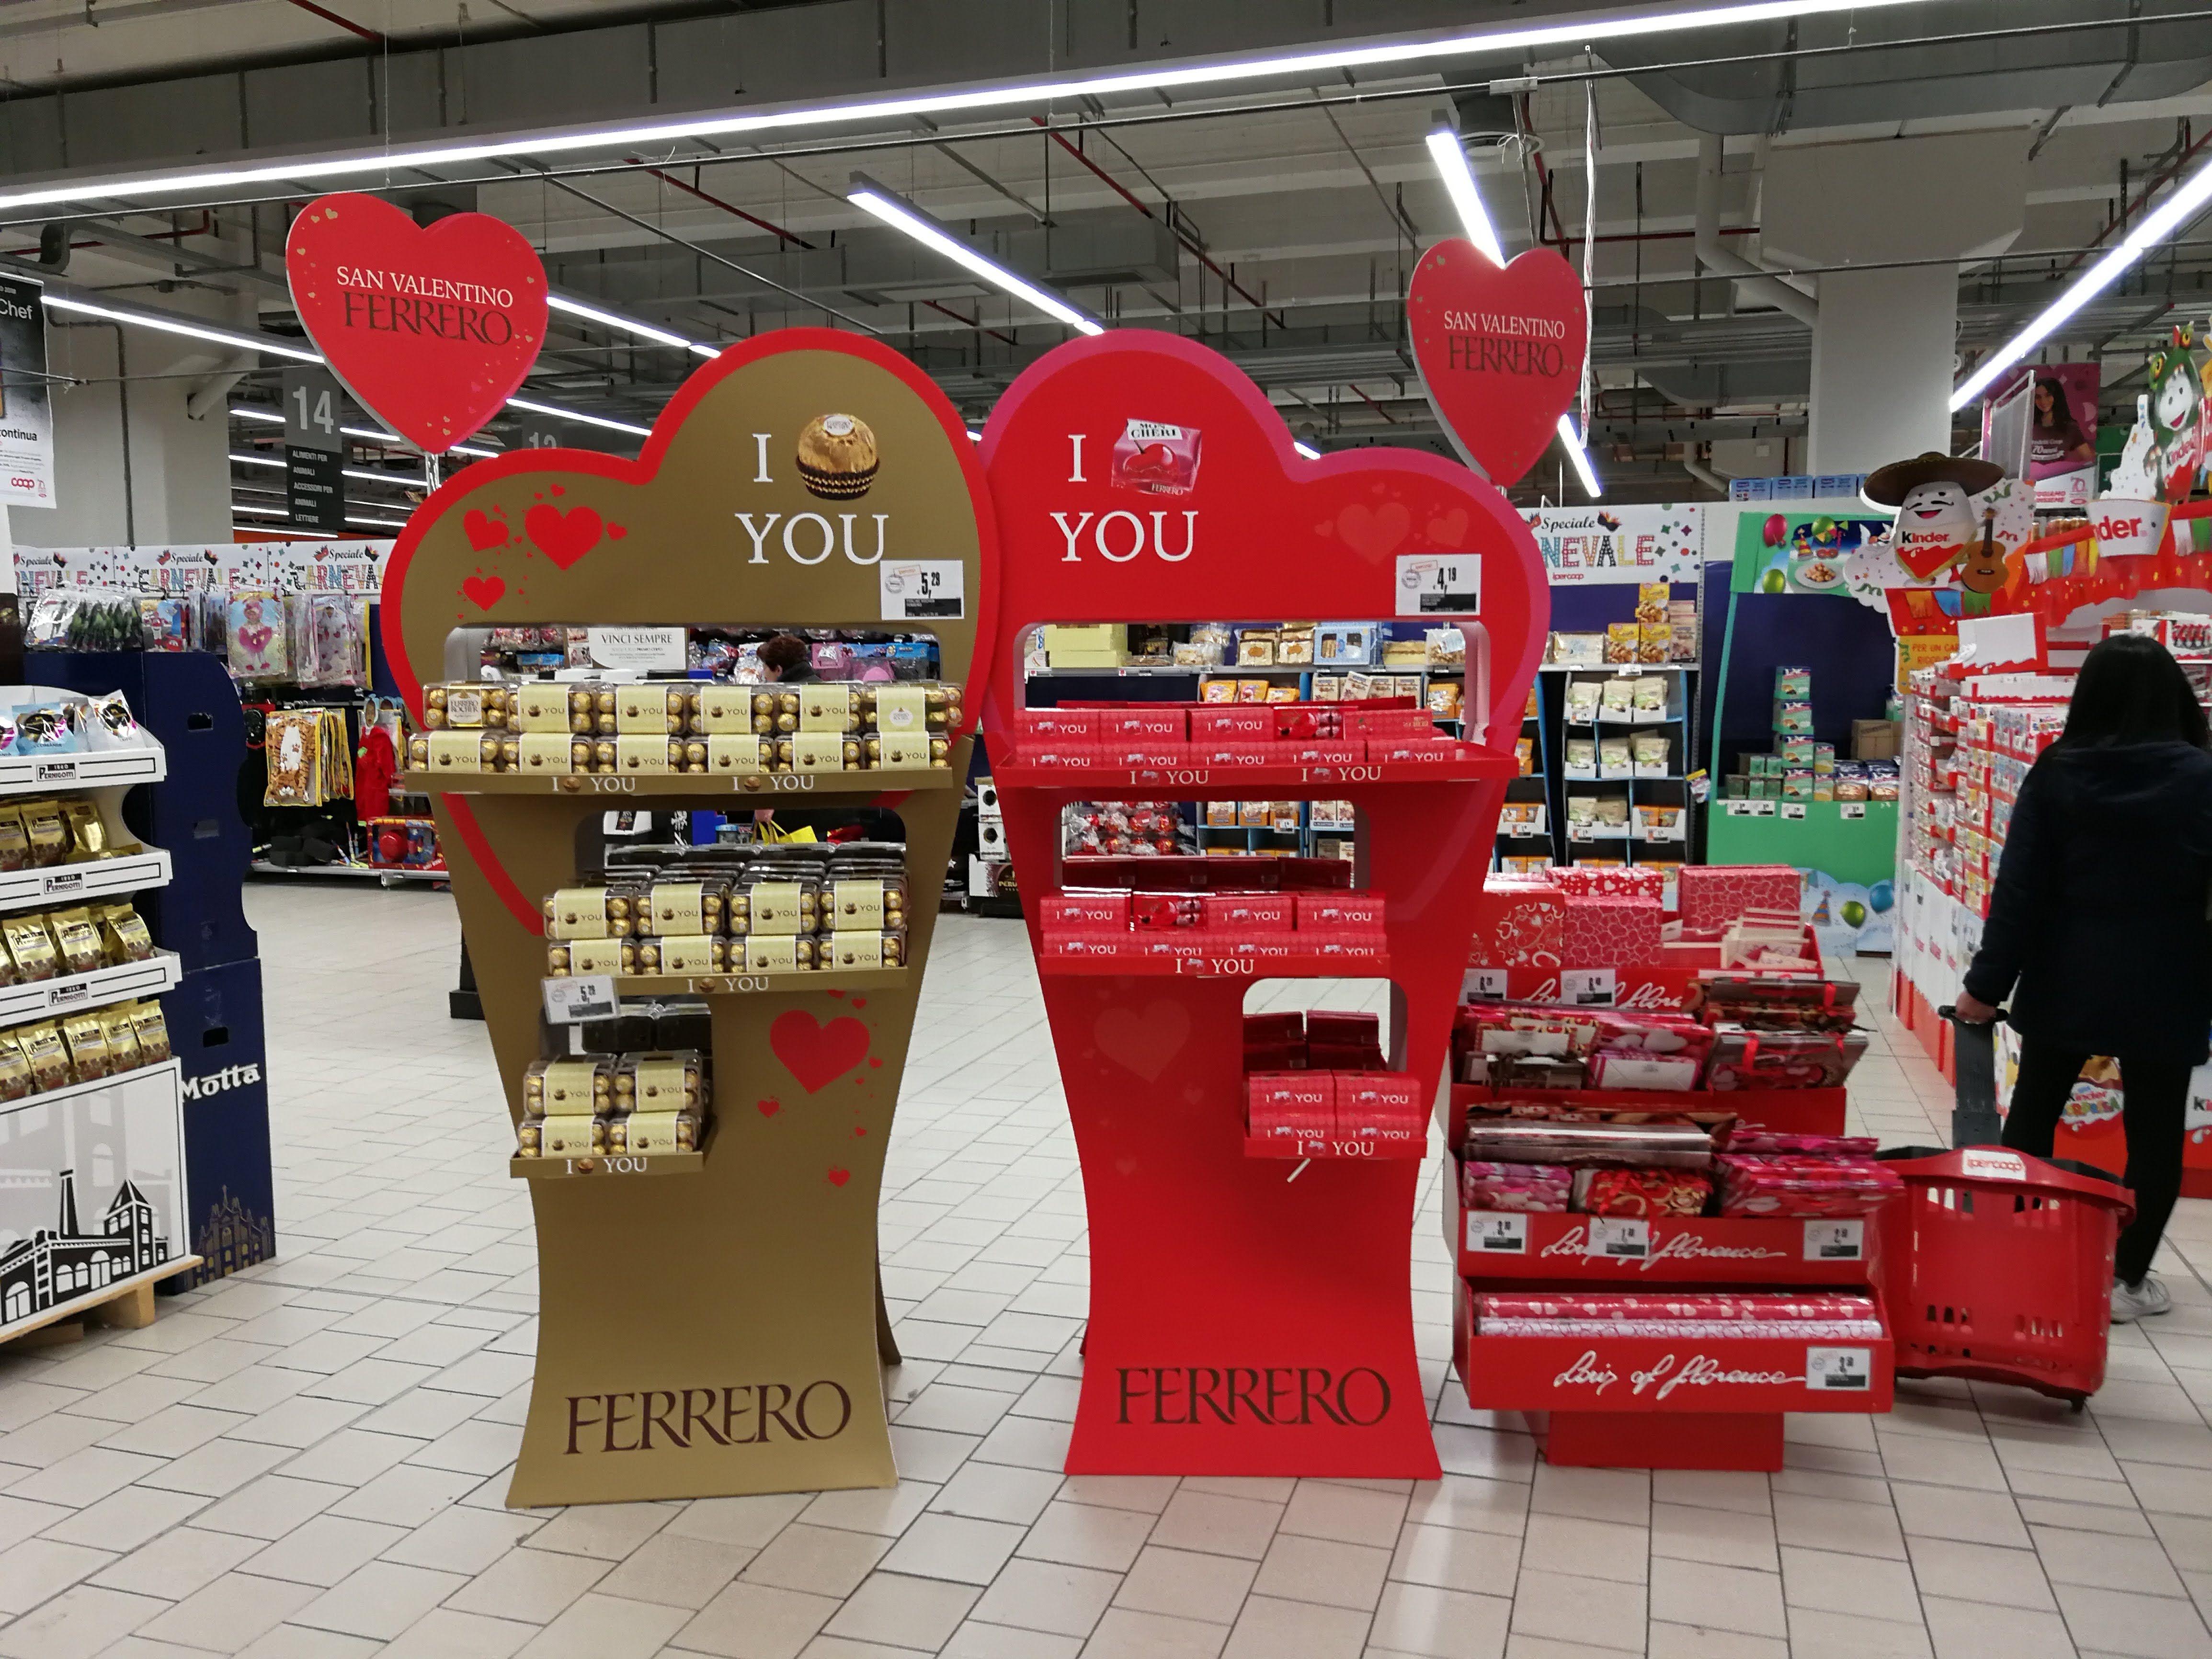 Ferrero San Valentino 2018 Mdf